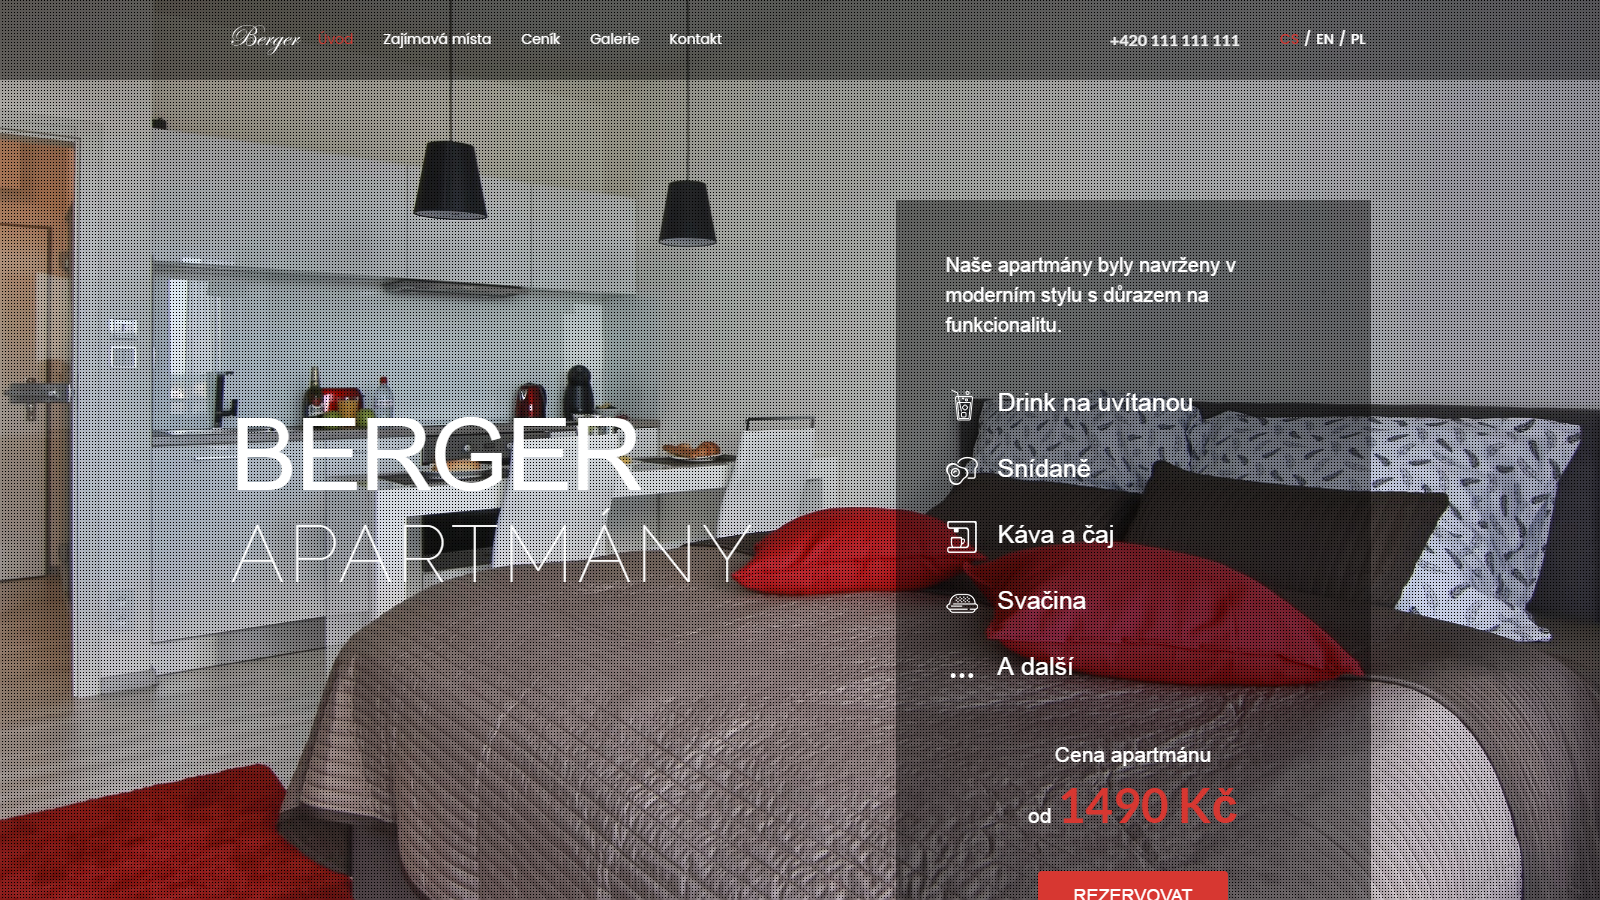 Berger apartmány